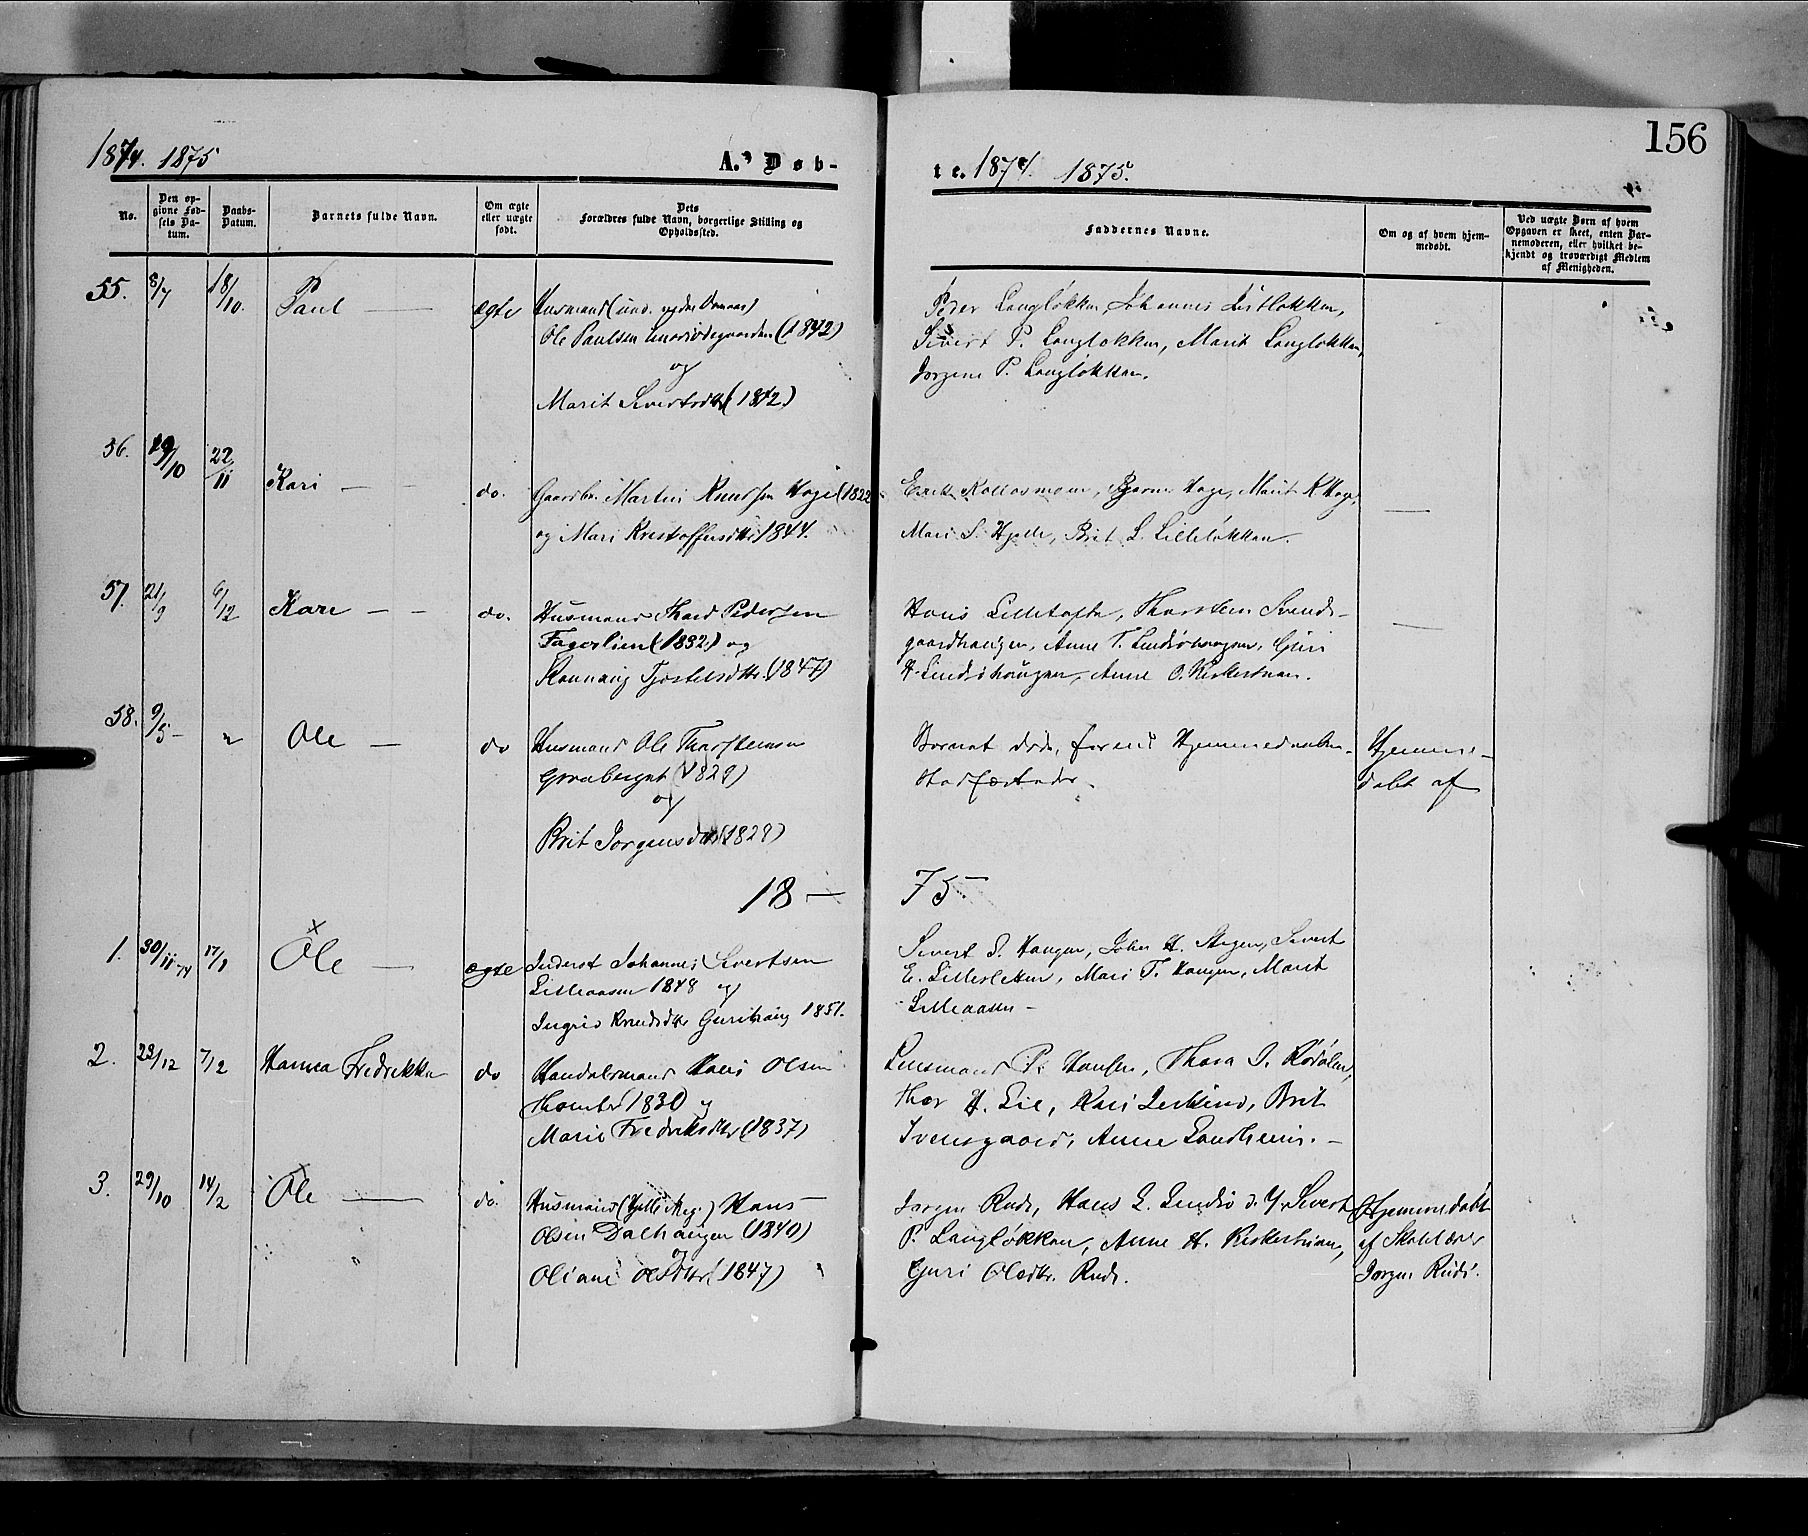 SAH, Dovre prestekontor, Ministerialbok nr. 1, 1854-1878, s. 156